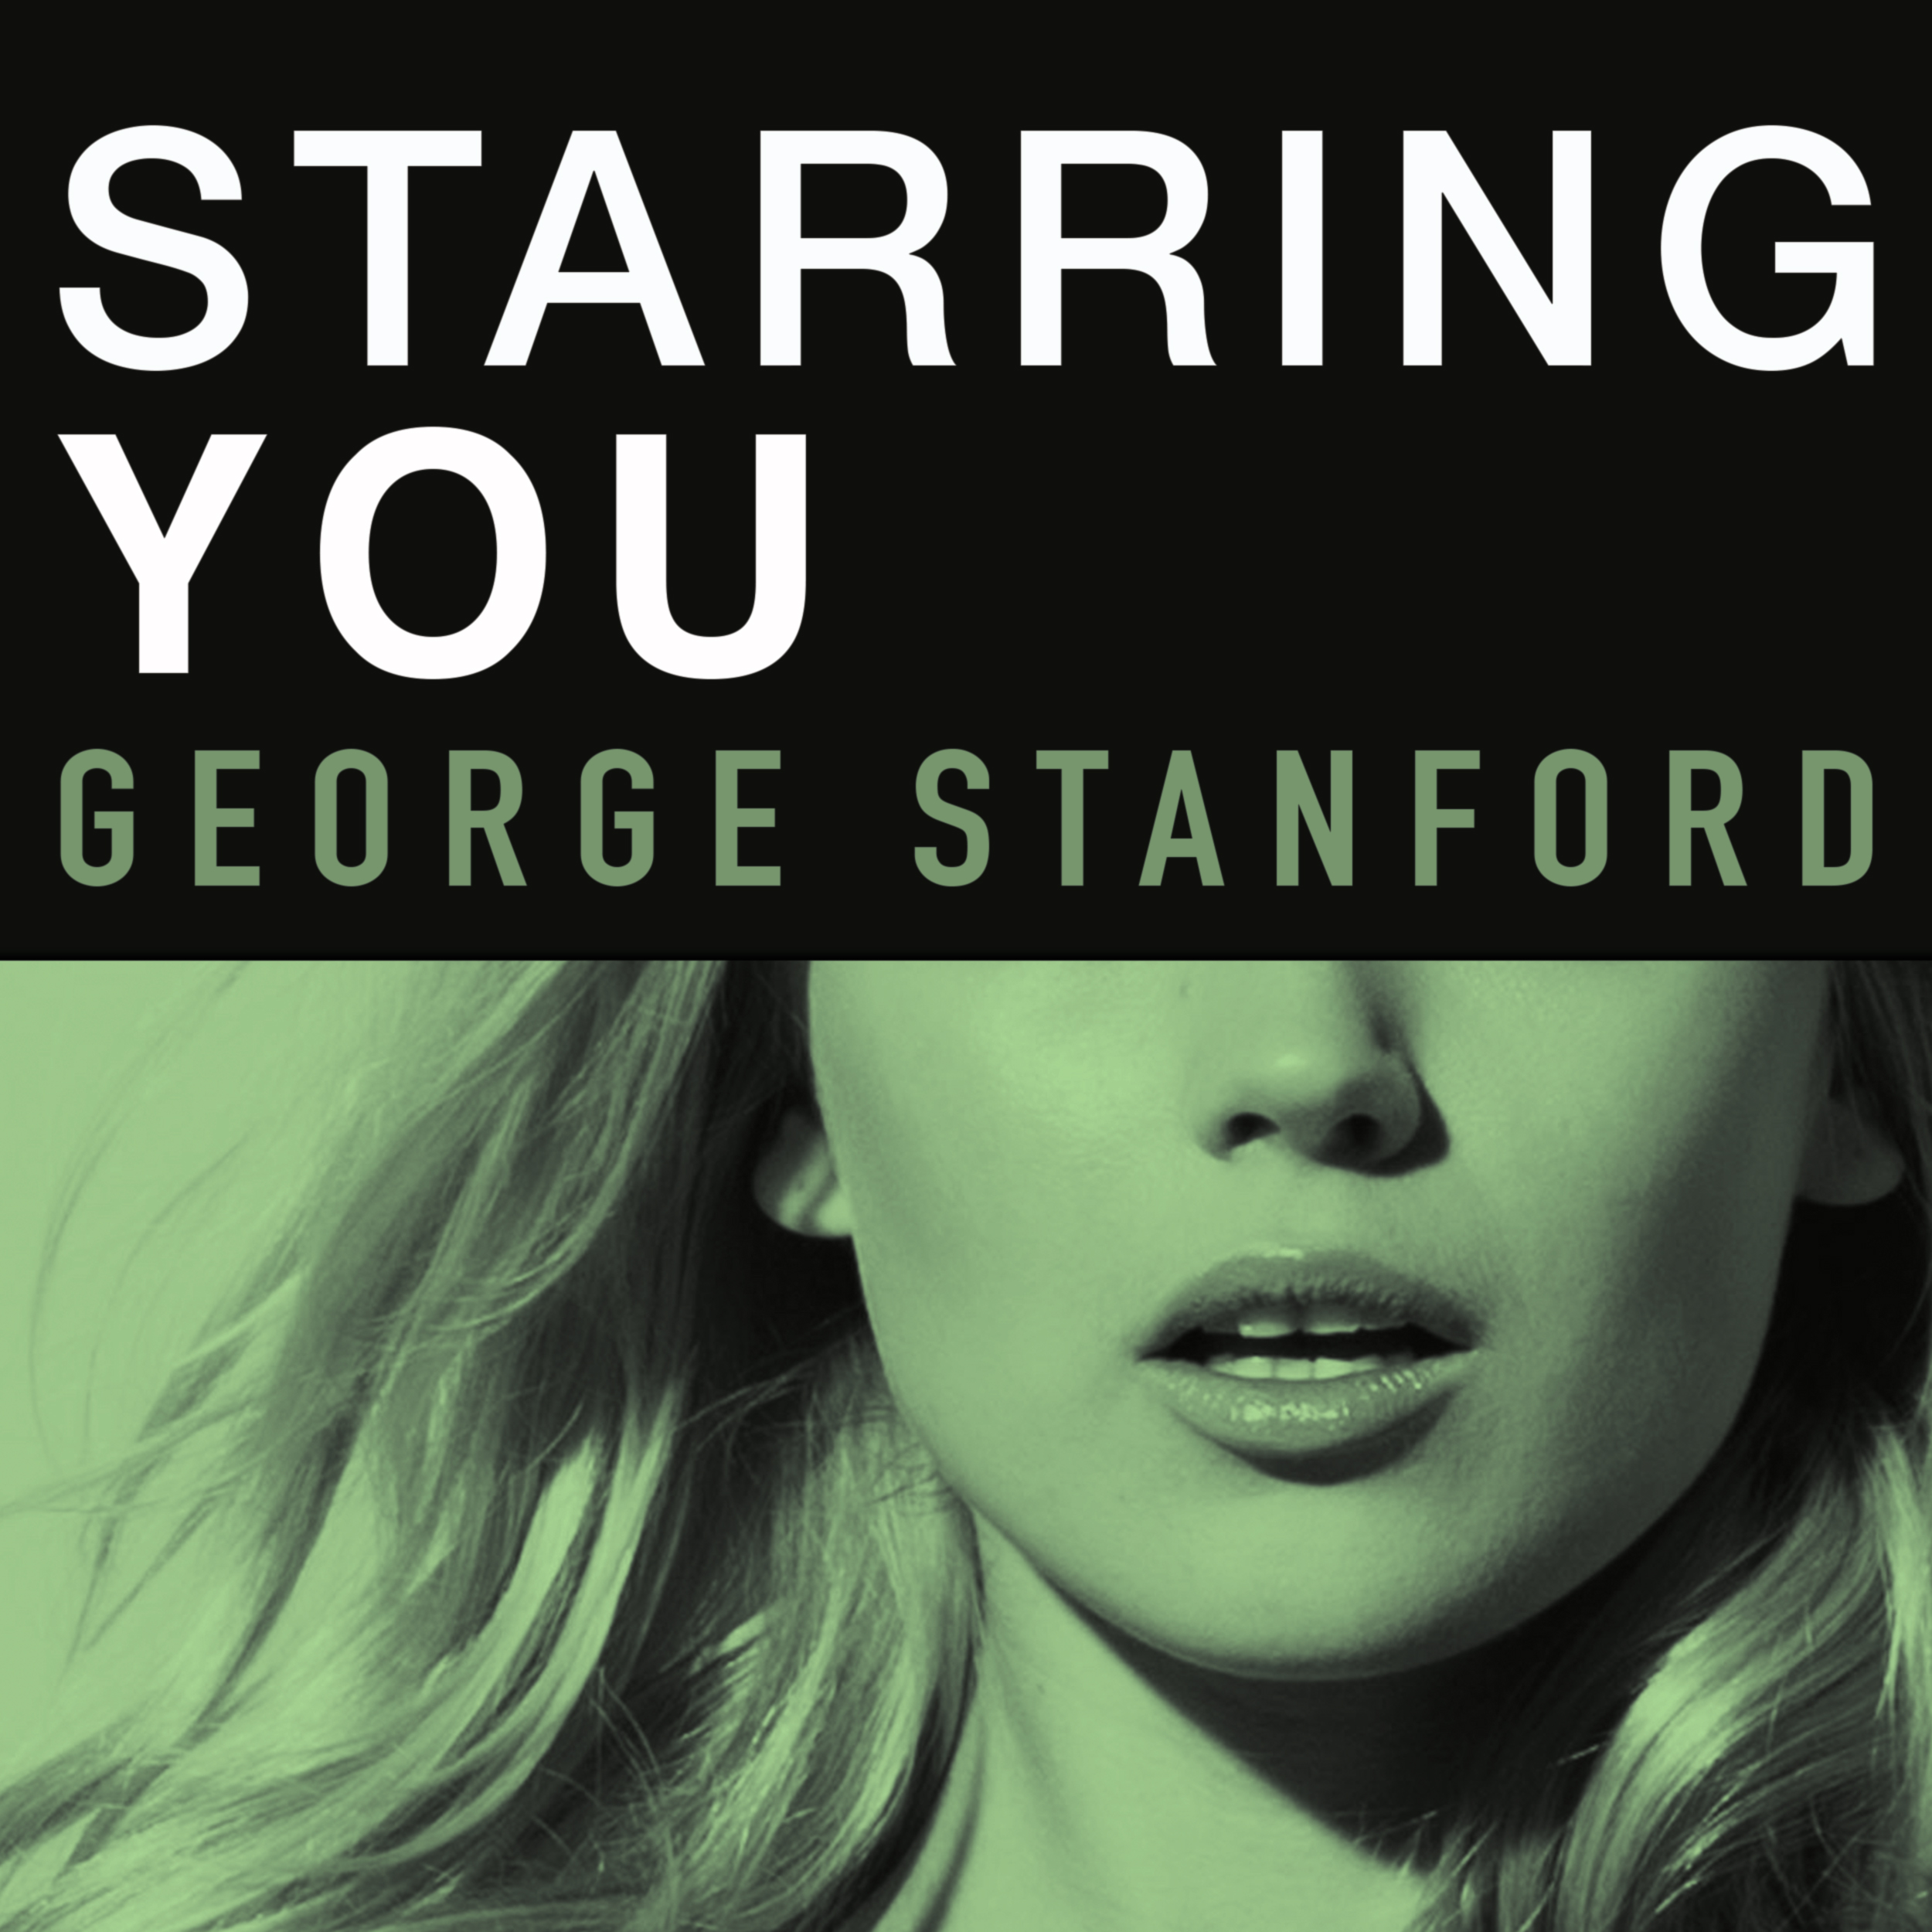 Starring-You-Single-Cover1.jpg